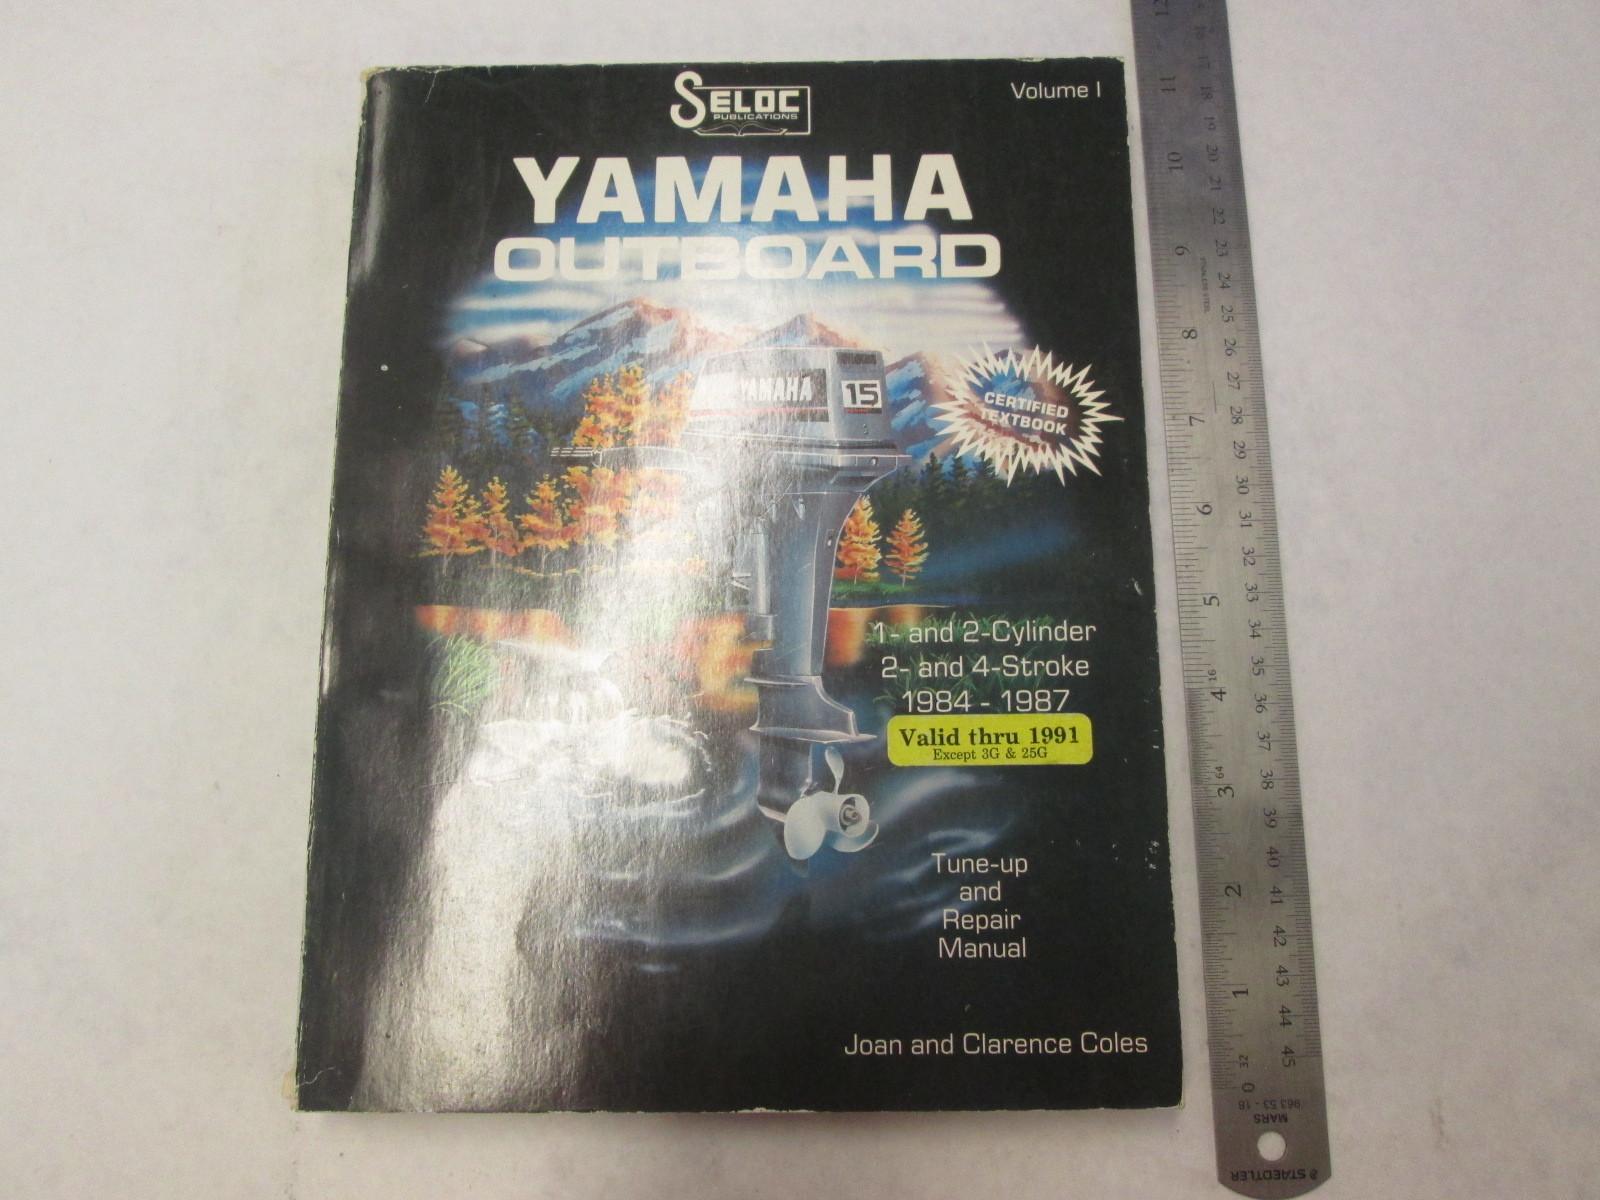 1984-1987 Seloc Yamaha Outboard Service Manual 1 & 2 Cyl 2 & 4 Stroke  Volume I